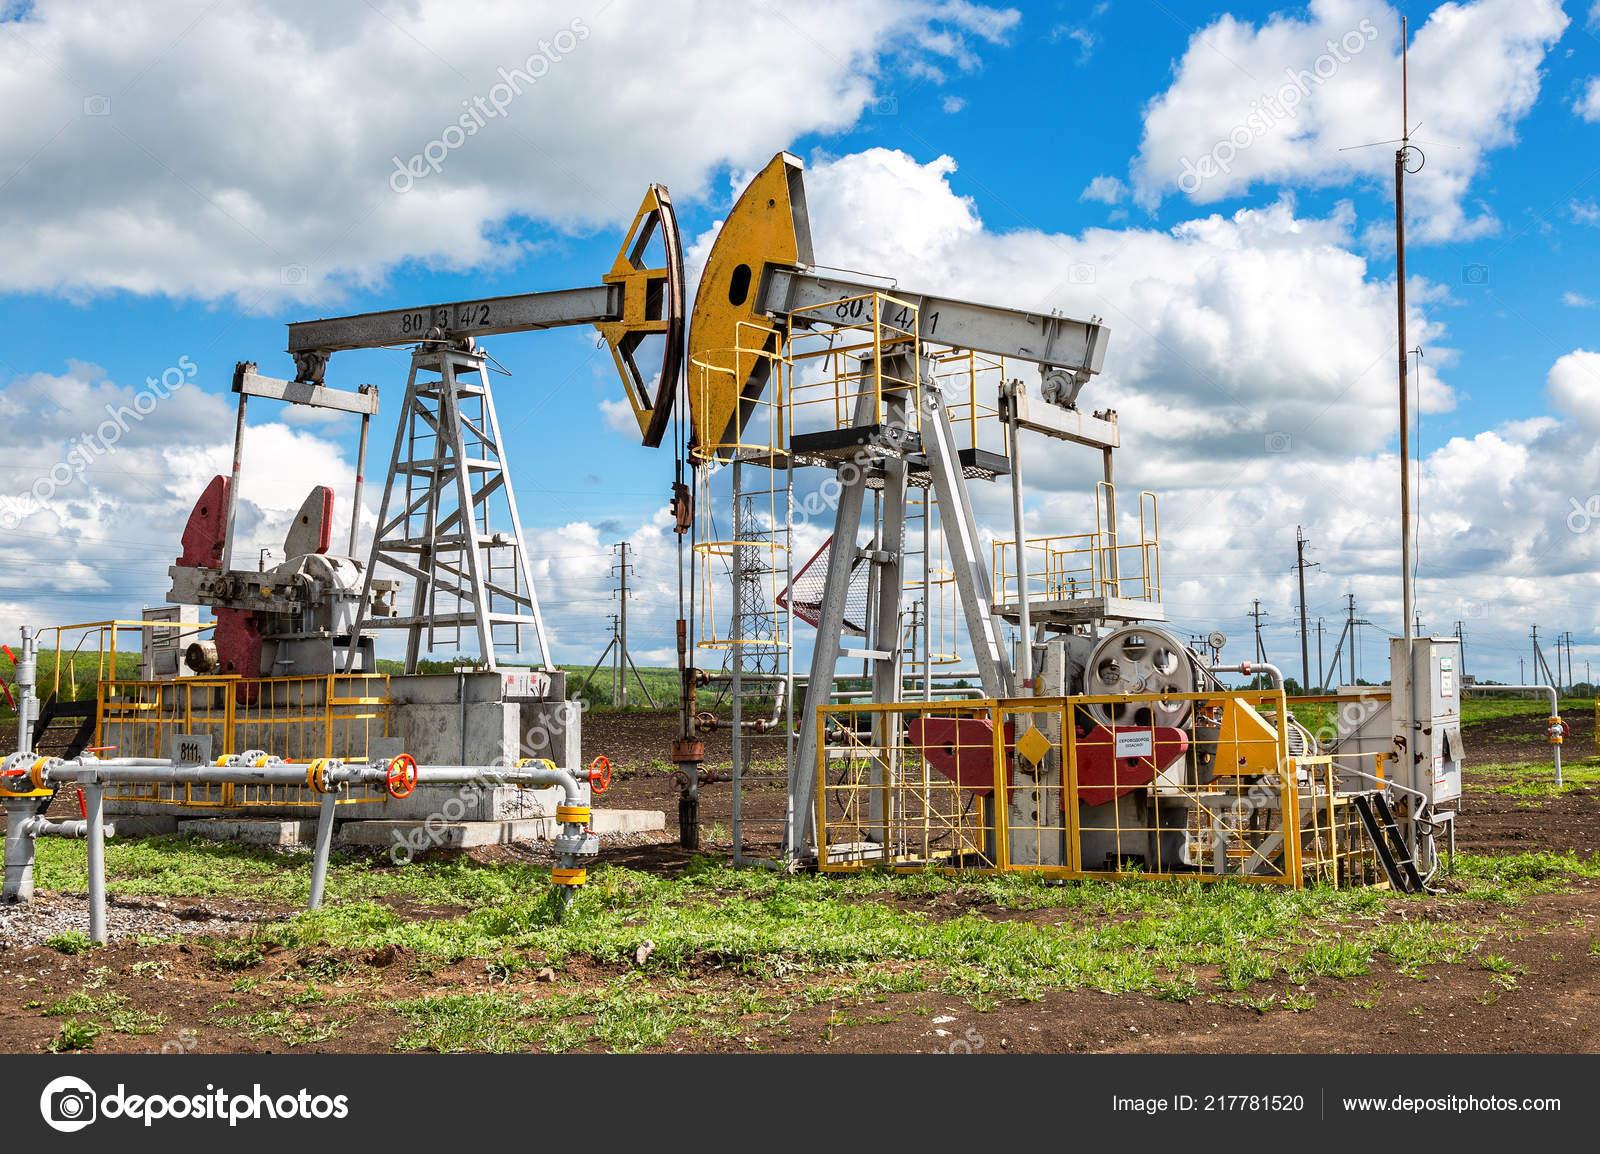 Tatarstan Russia June 2018 Working Pump Jack Fracking Crude